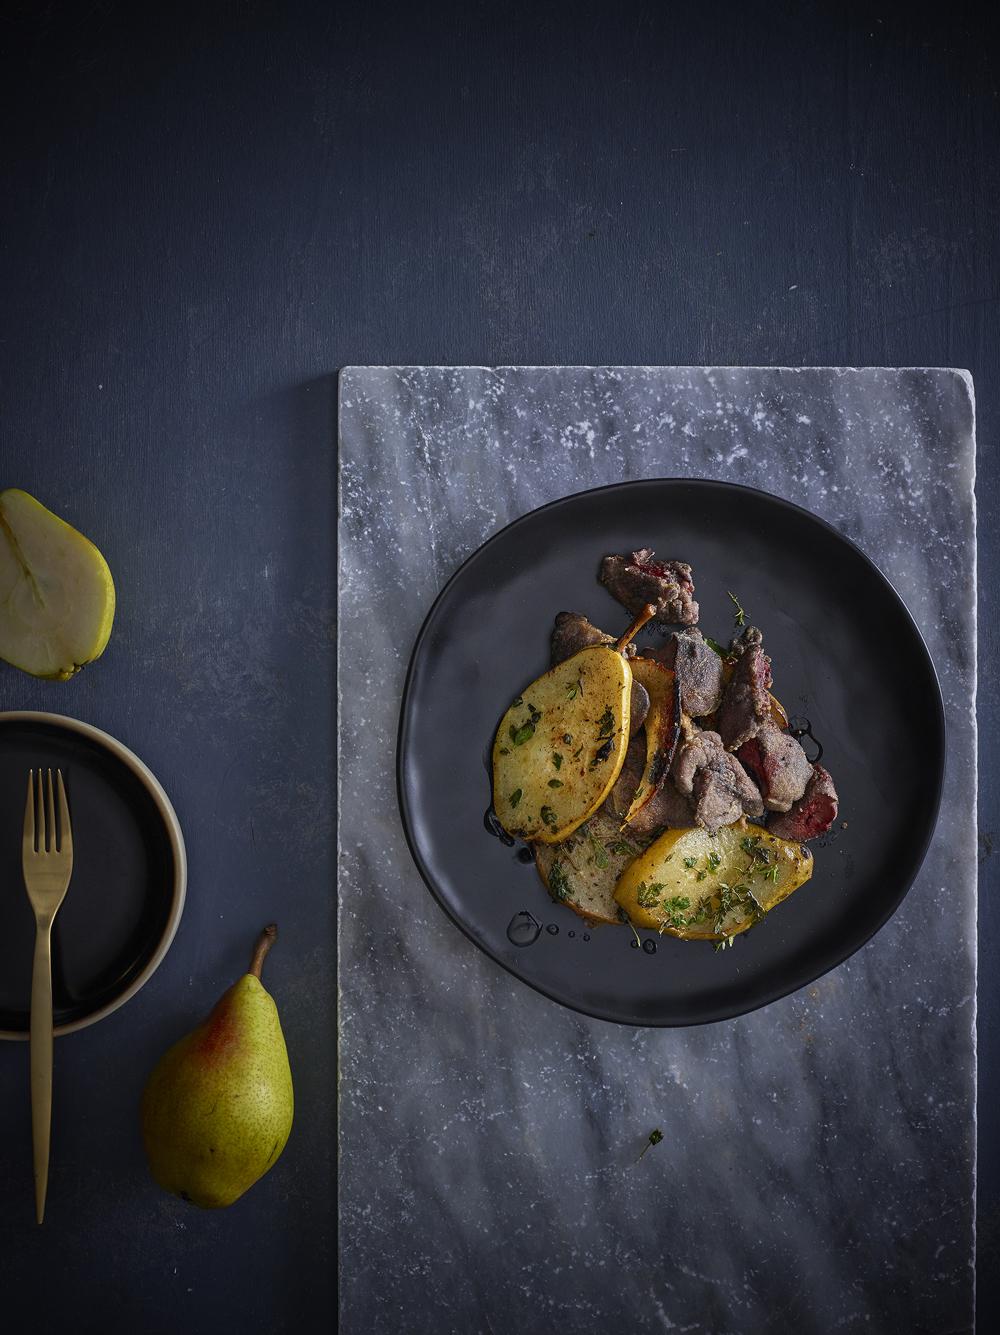 biedronka – kuchnia polska